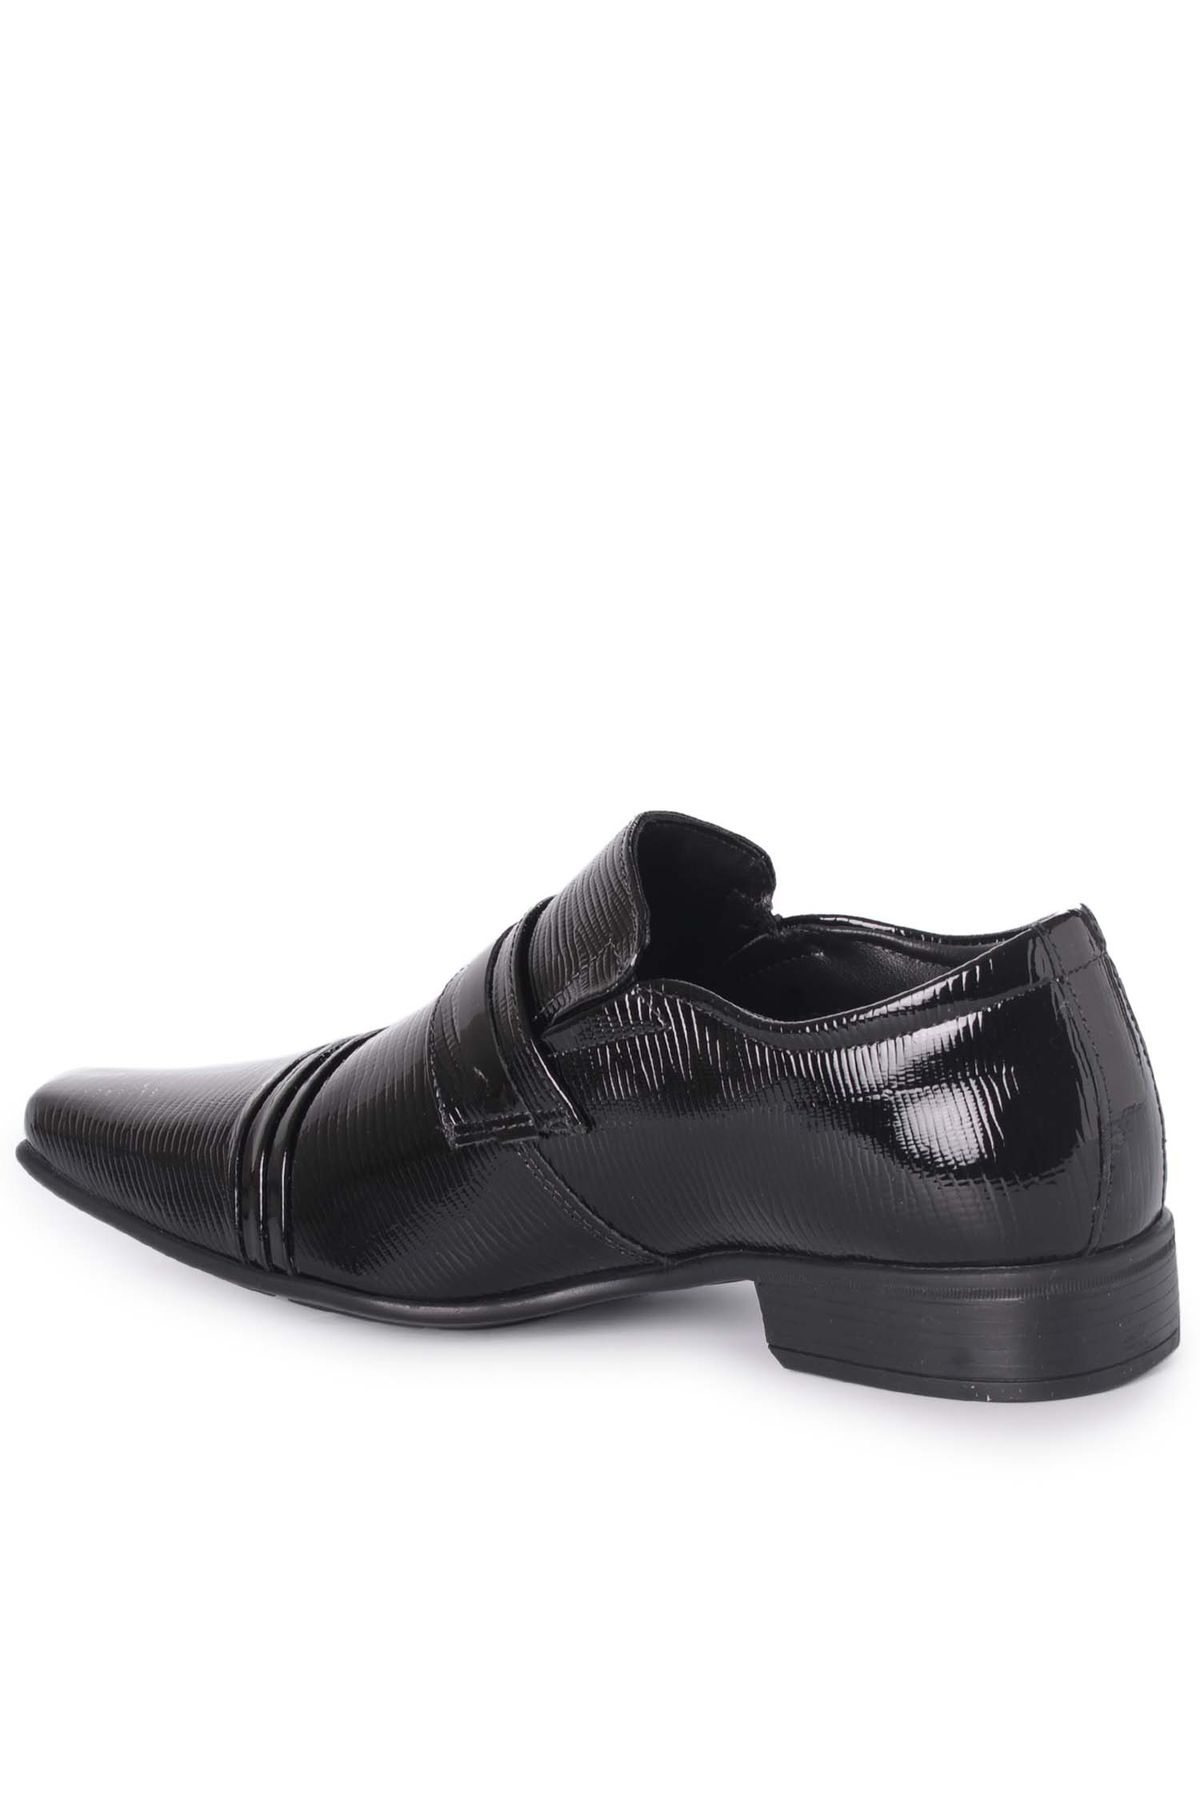 aa3b961edd Sapato Masculino Jota Pe Air Prince   Mundial Calçados - Mundial ...